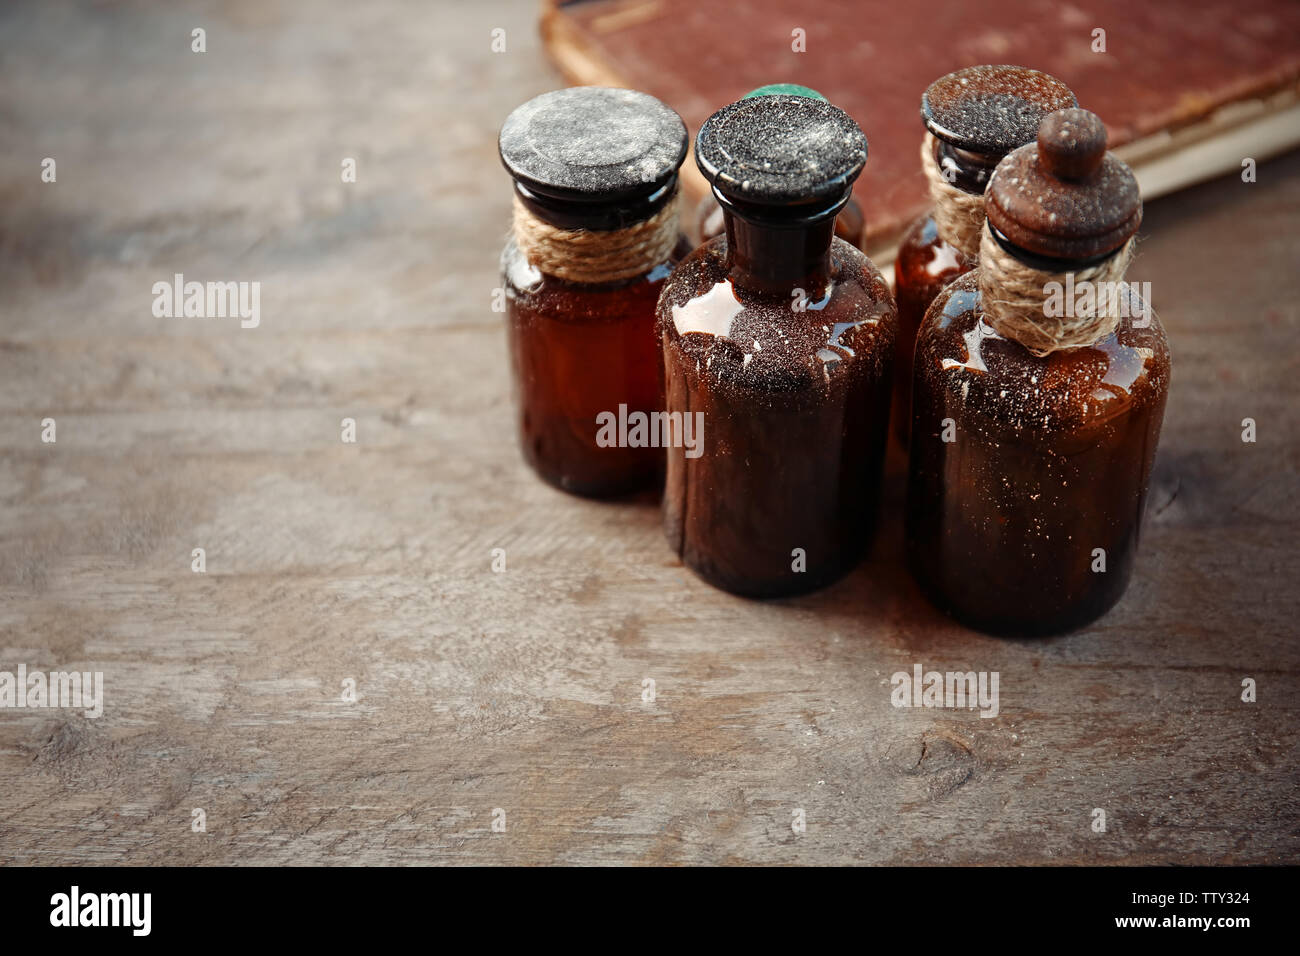 Vintage glass bottles on wooden background, closeup - Stock Image